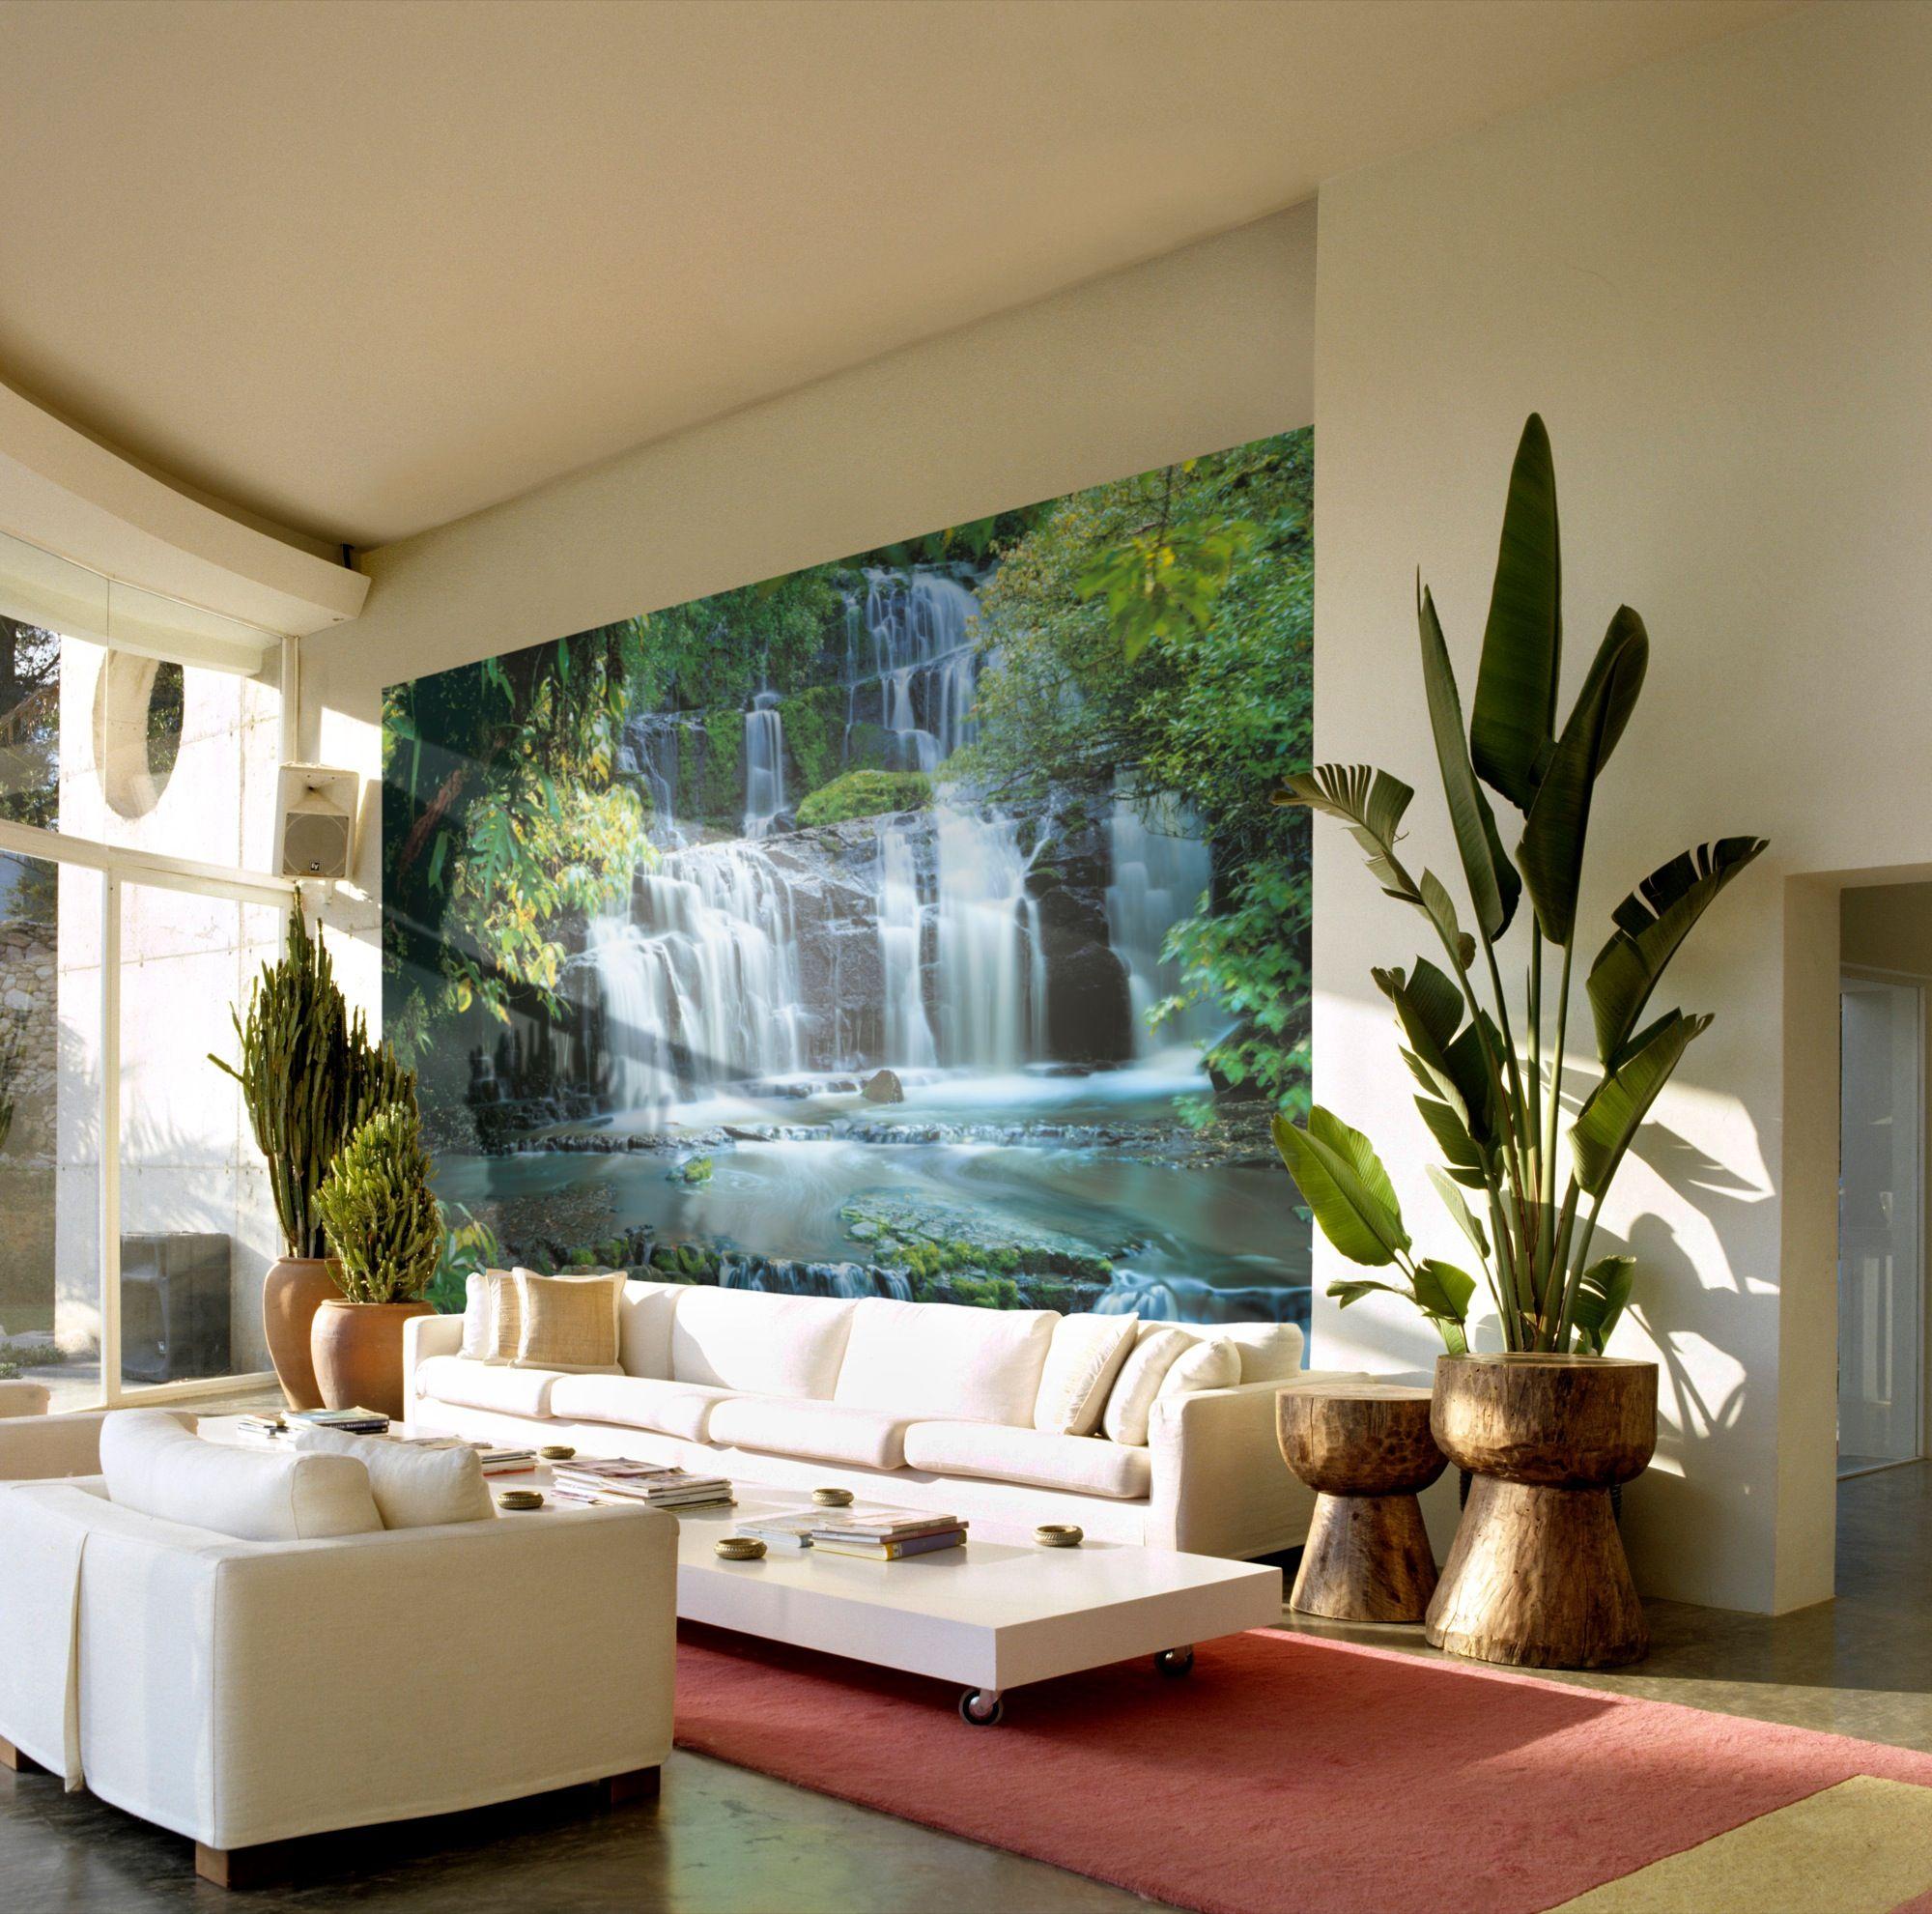 fototapete aus eigenen fotos latest excellent eigene. Black Bedroom Furniture Sets. Home Design Ideas